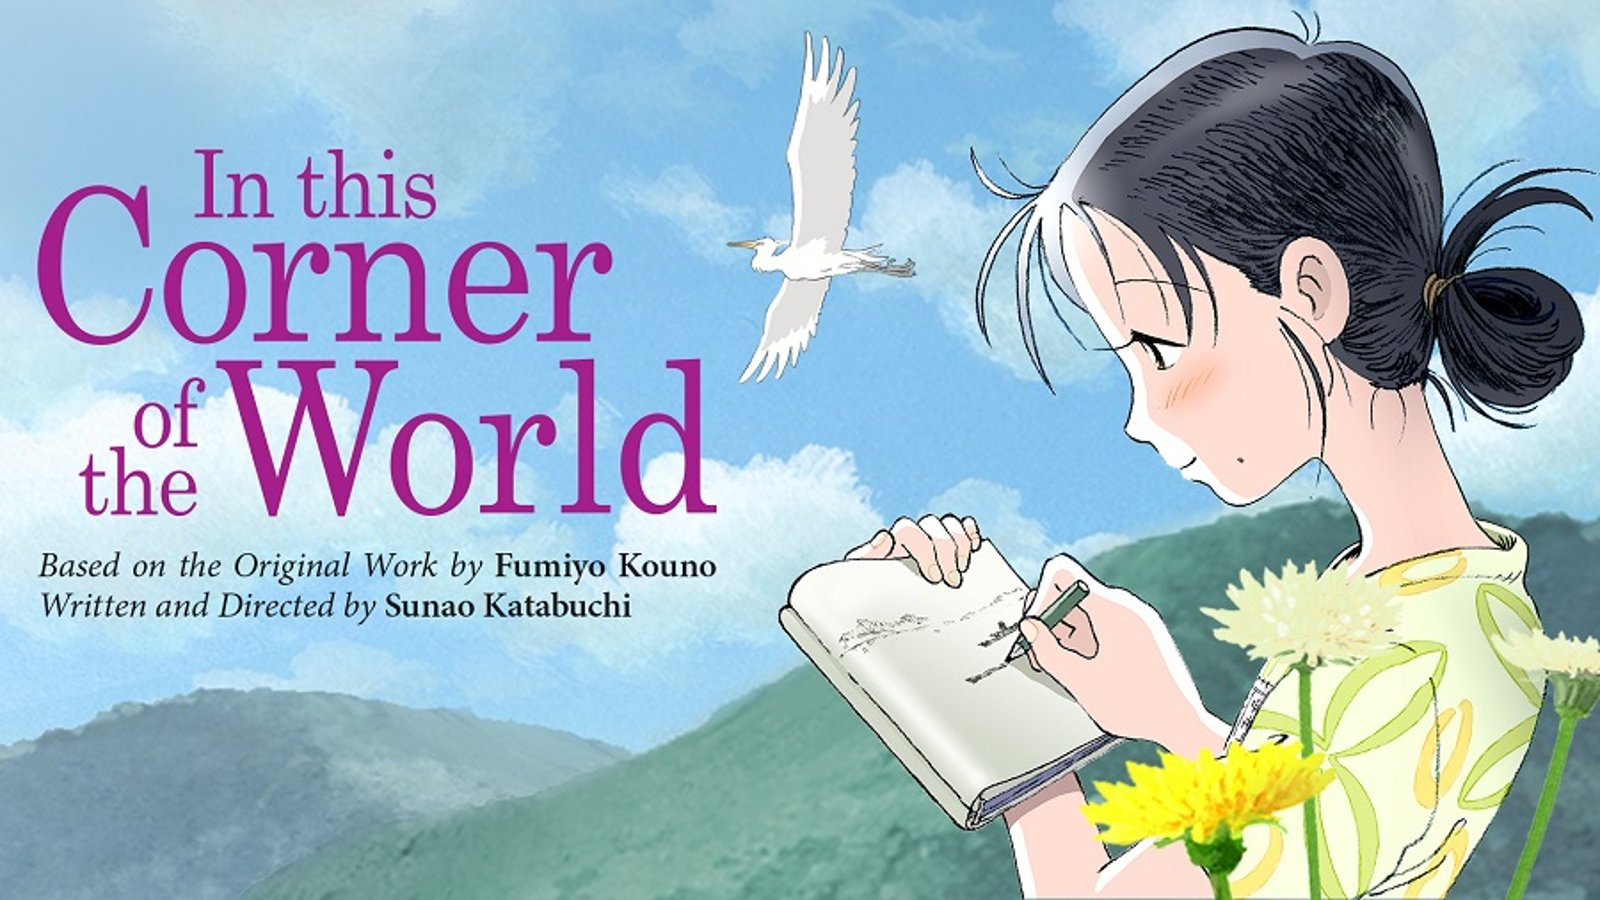 In This Corner of the World - Kono sekai no katasumi ni